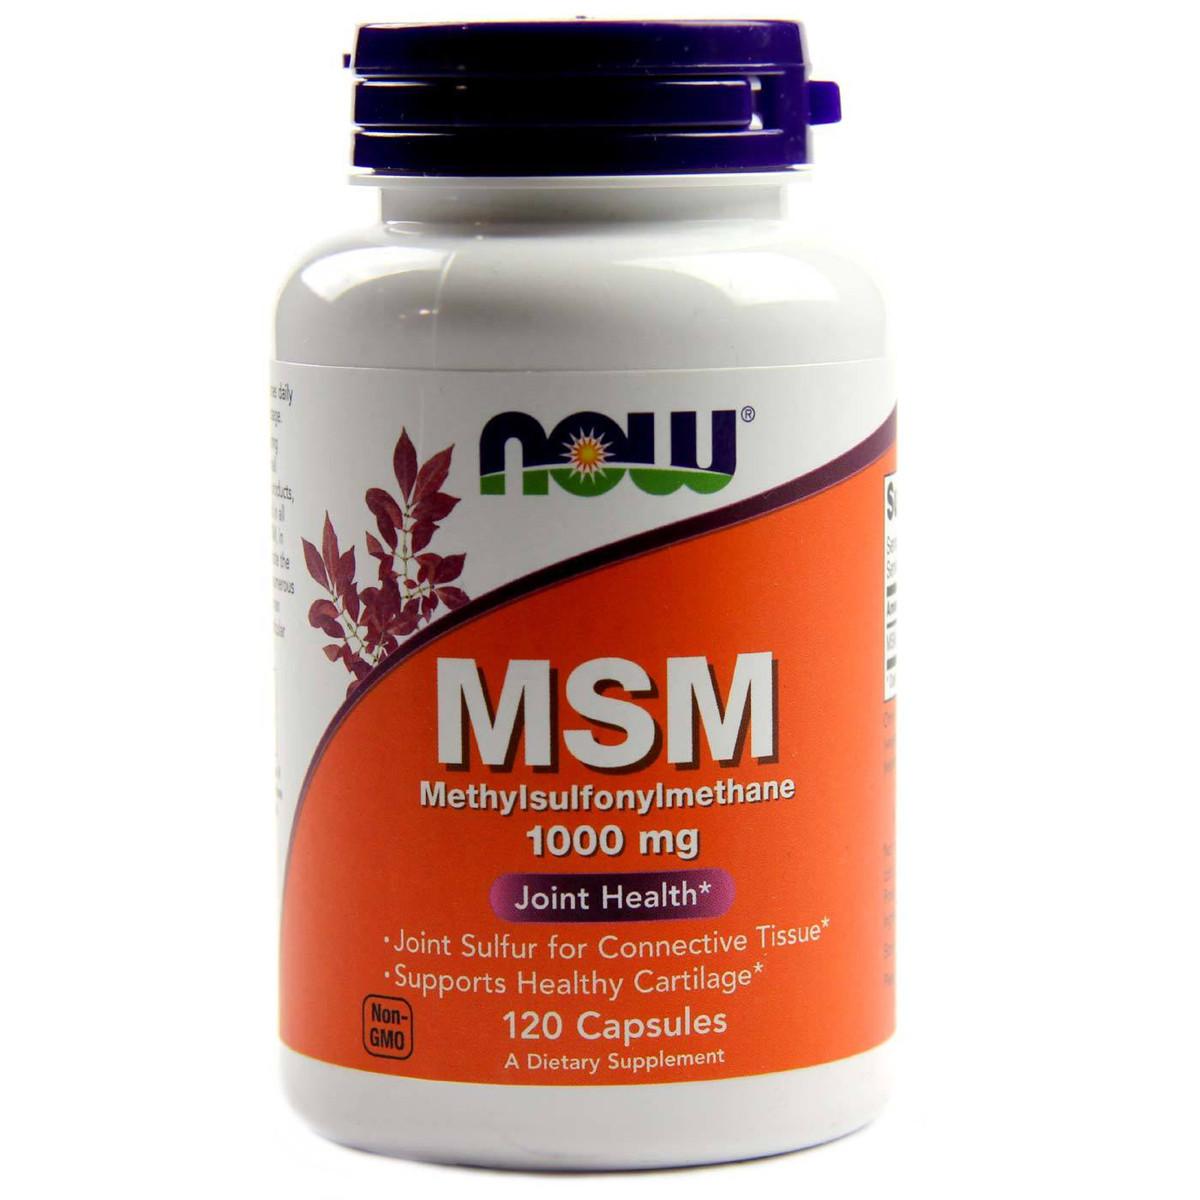 МСМ (Метилсульфонинметан), MSM, Now Foods, 1000 мг, 120 капсул